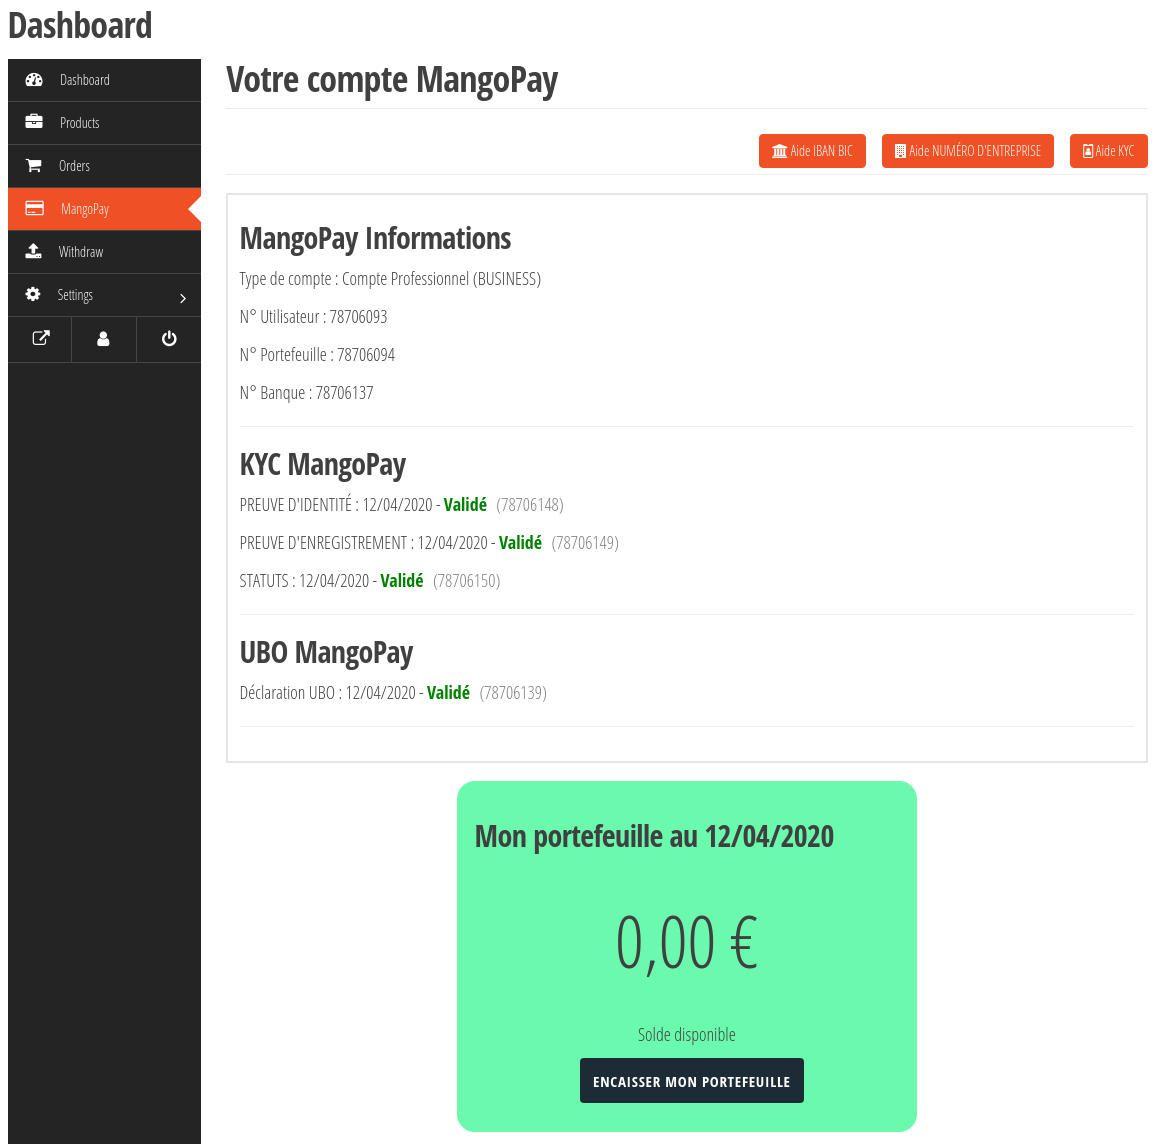 Wcgatewaymp Vendor Mangopay Dashboard Pro Wallet 0